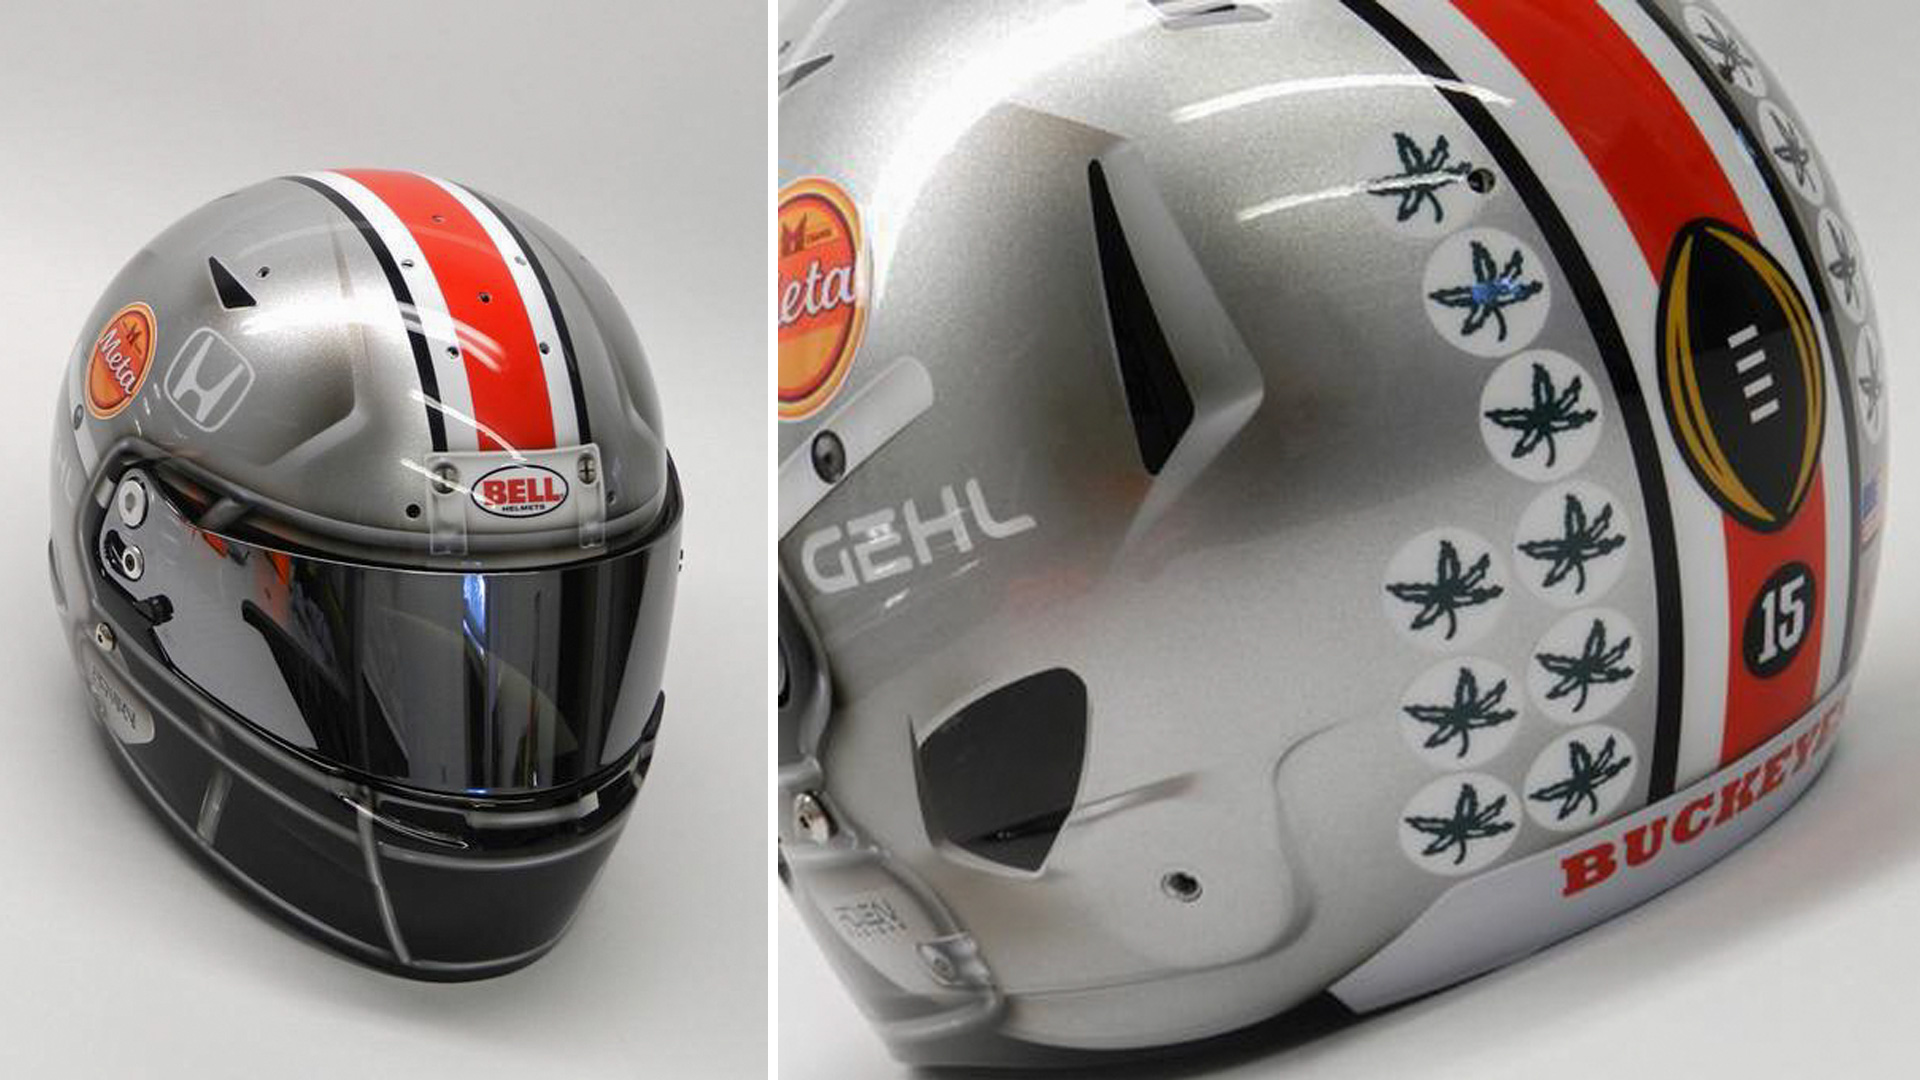 Ohio St helmet-072915-RAHAL-FTR.jpg